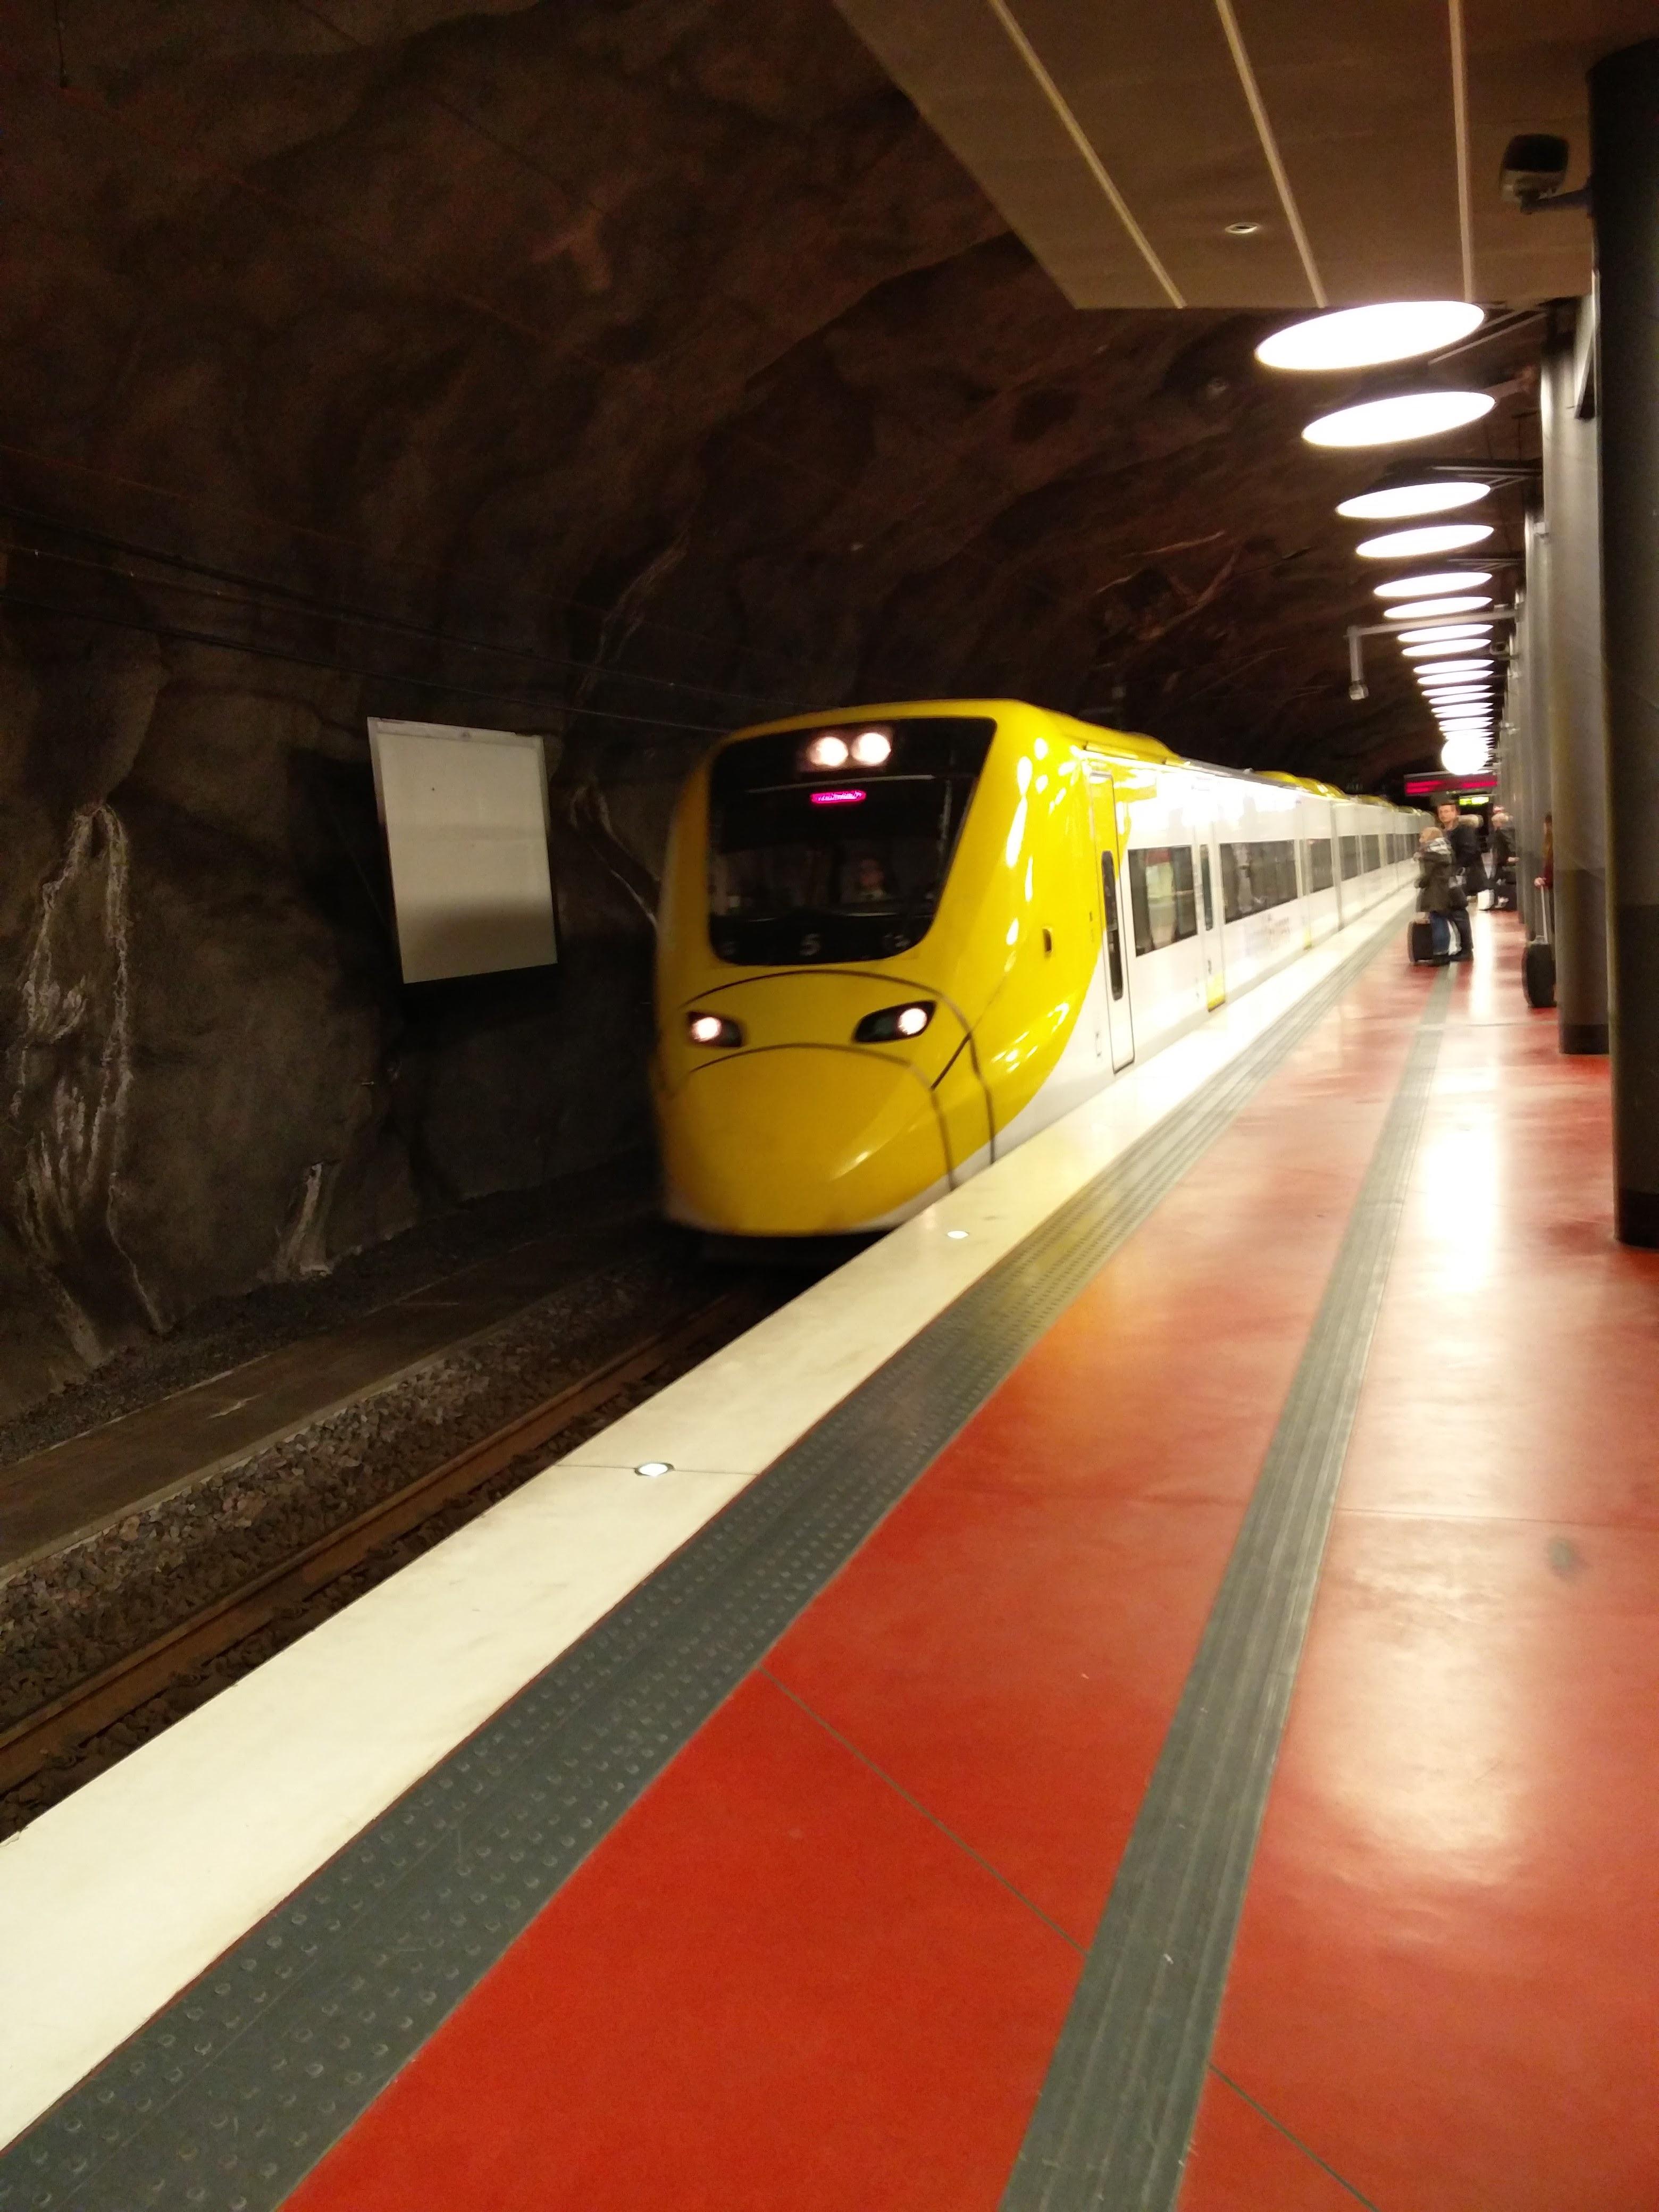 File:Arlanda Express dans le terminal 2 jpg - Wikipedia